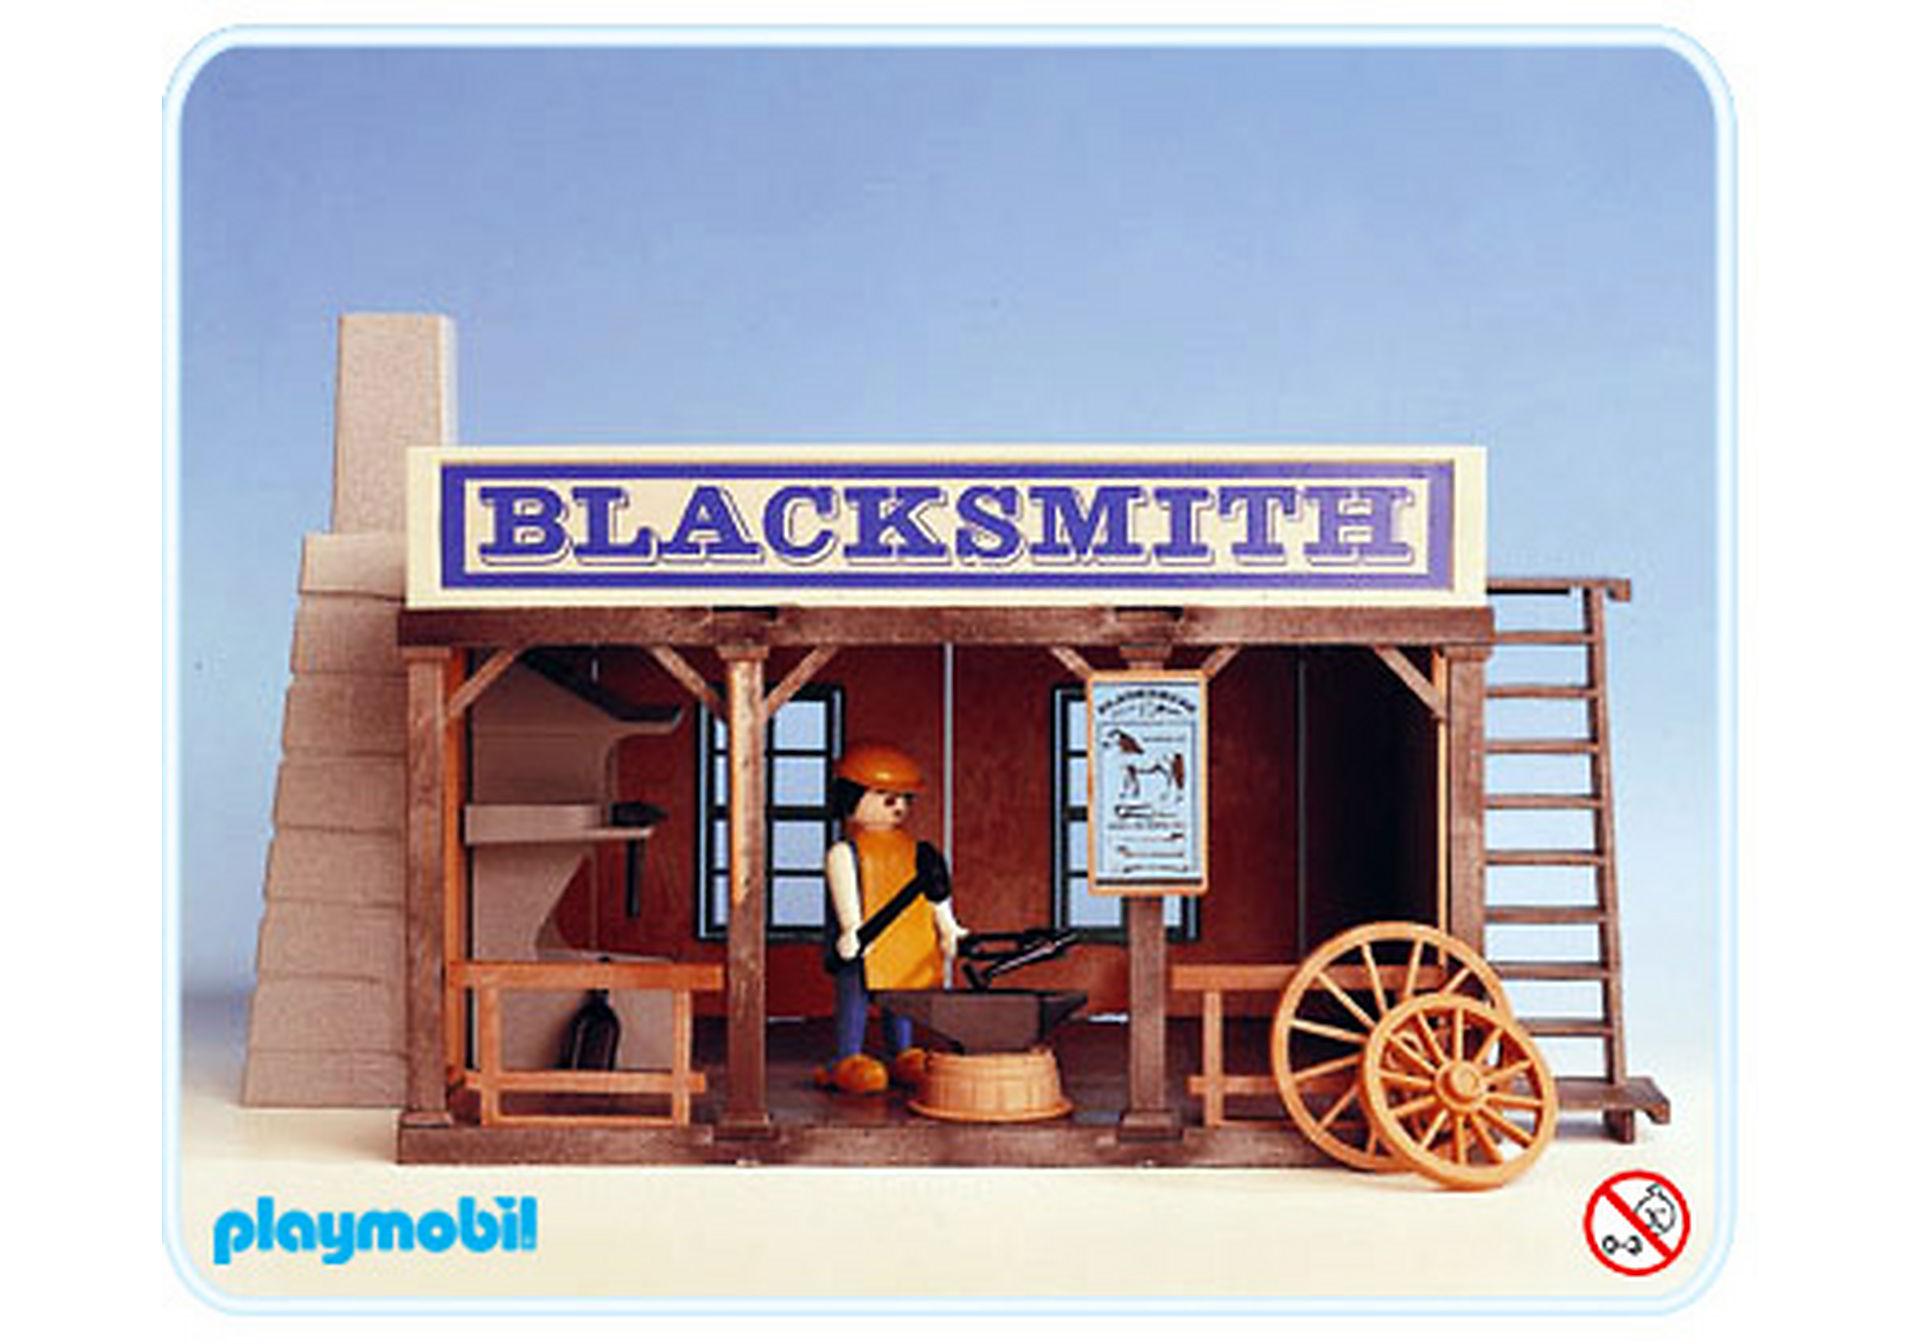 3430-A Blacksmith zoom image1